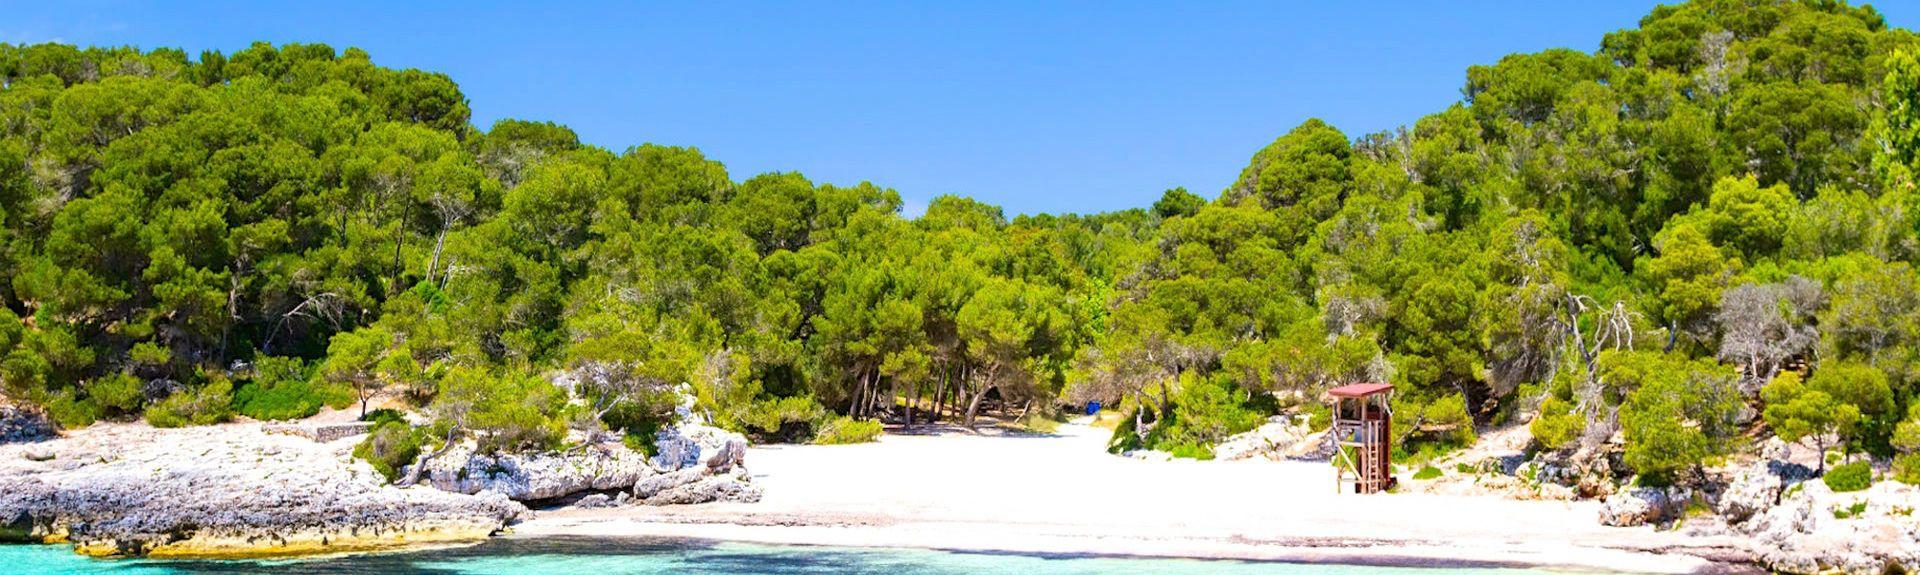 Cala Santandria, Ciudadela de Menorca, Islas Baleares, España